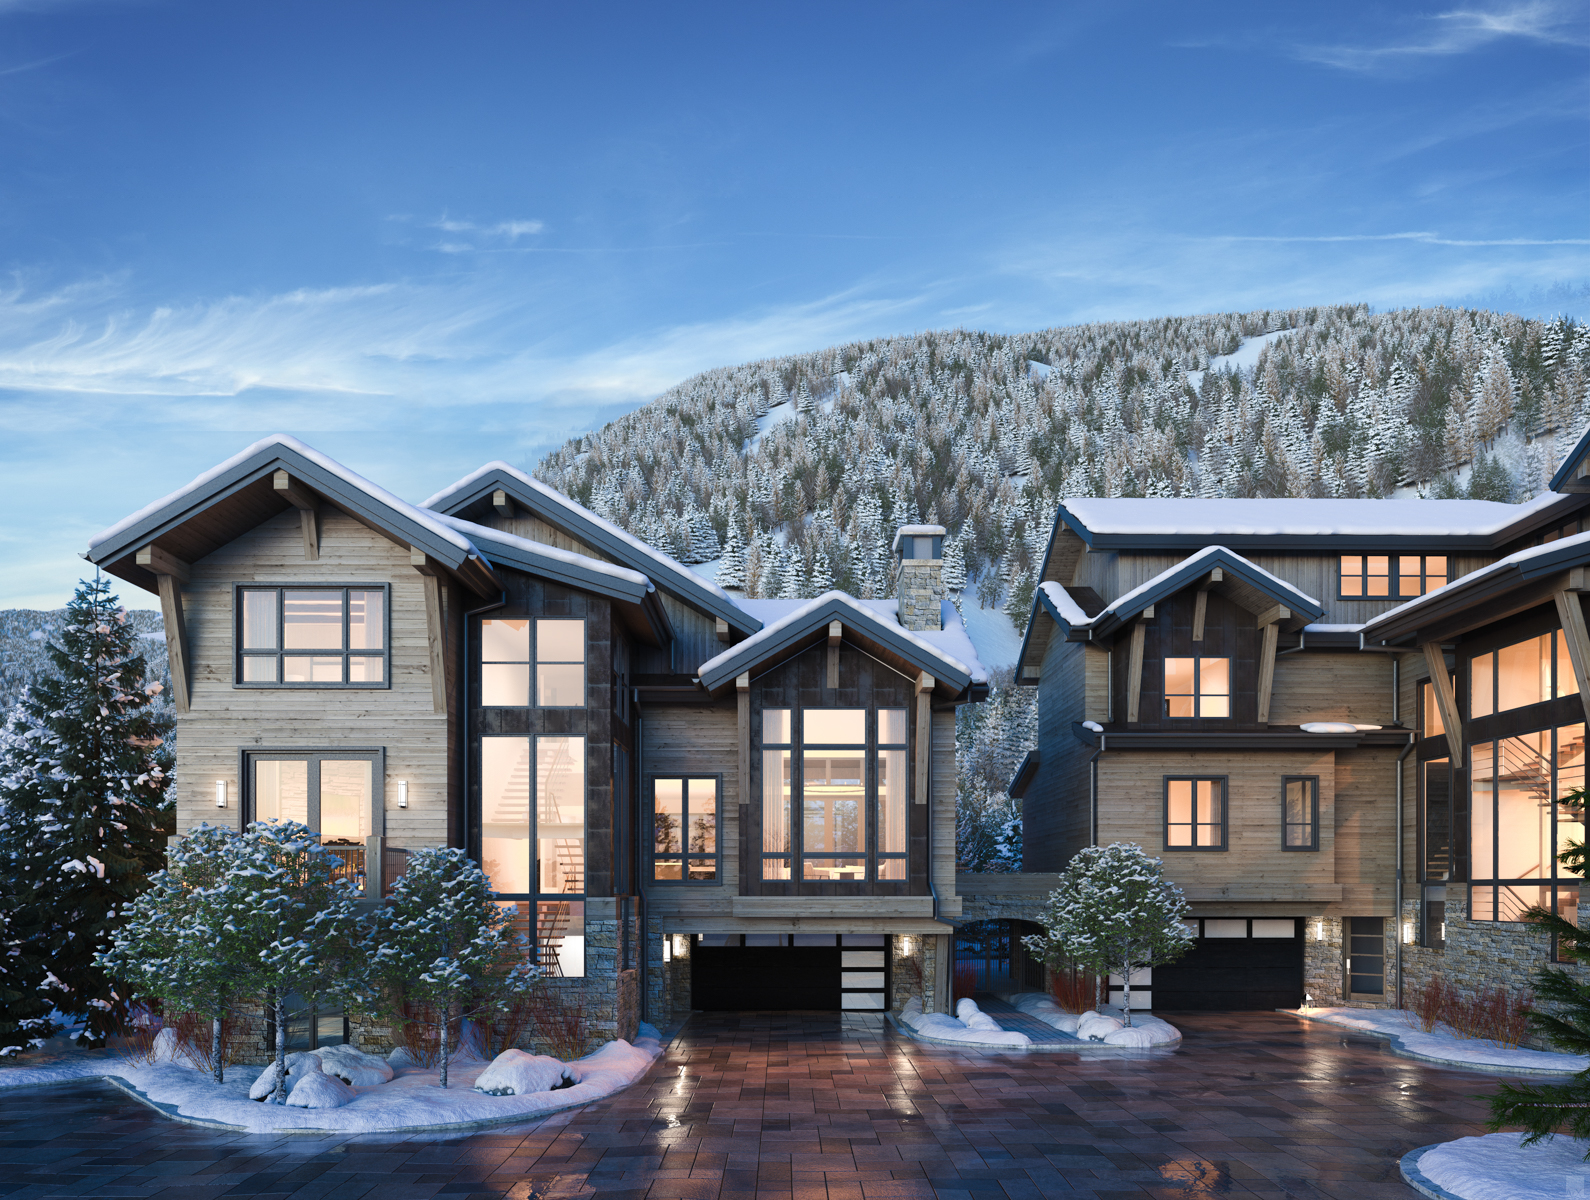 Exterior rendering of the villas showing winter weather